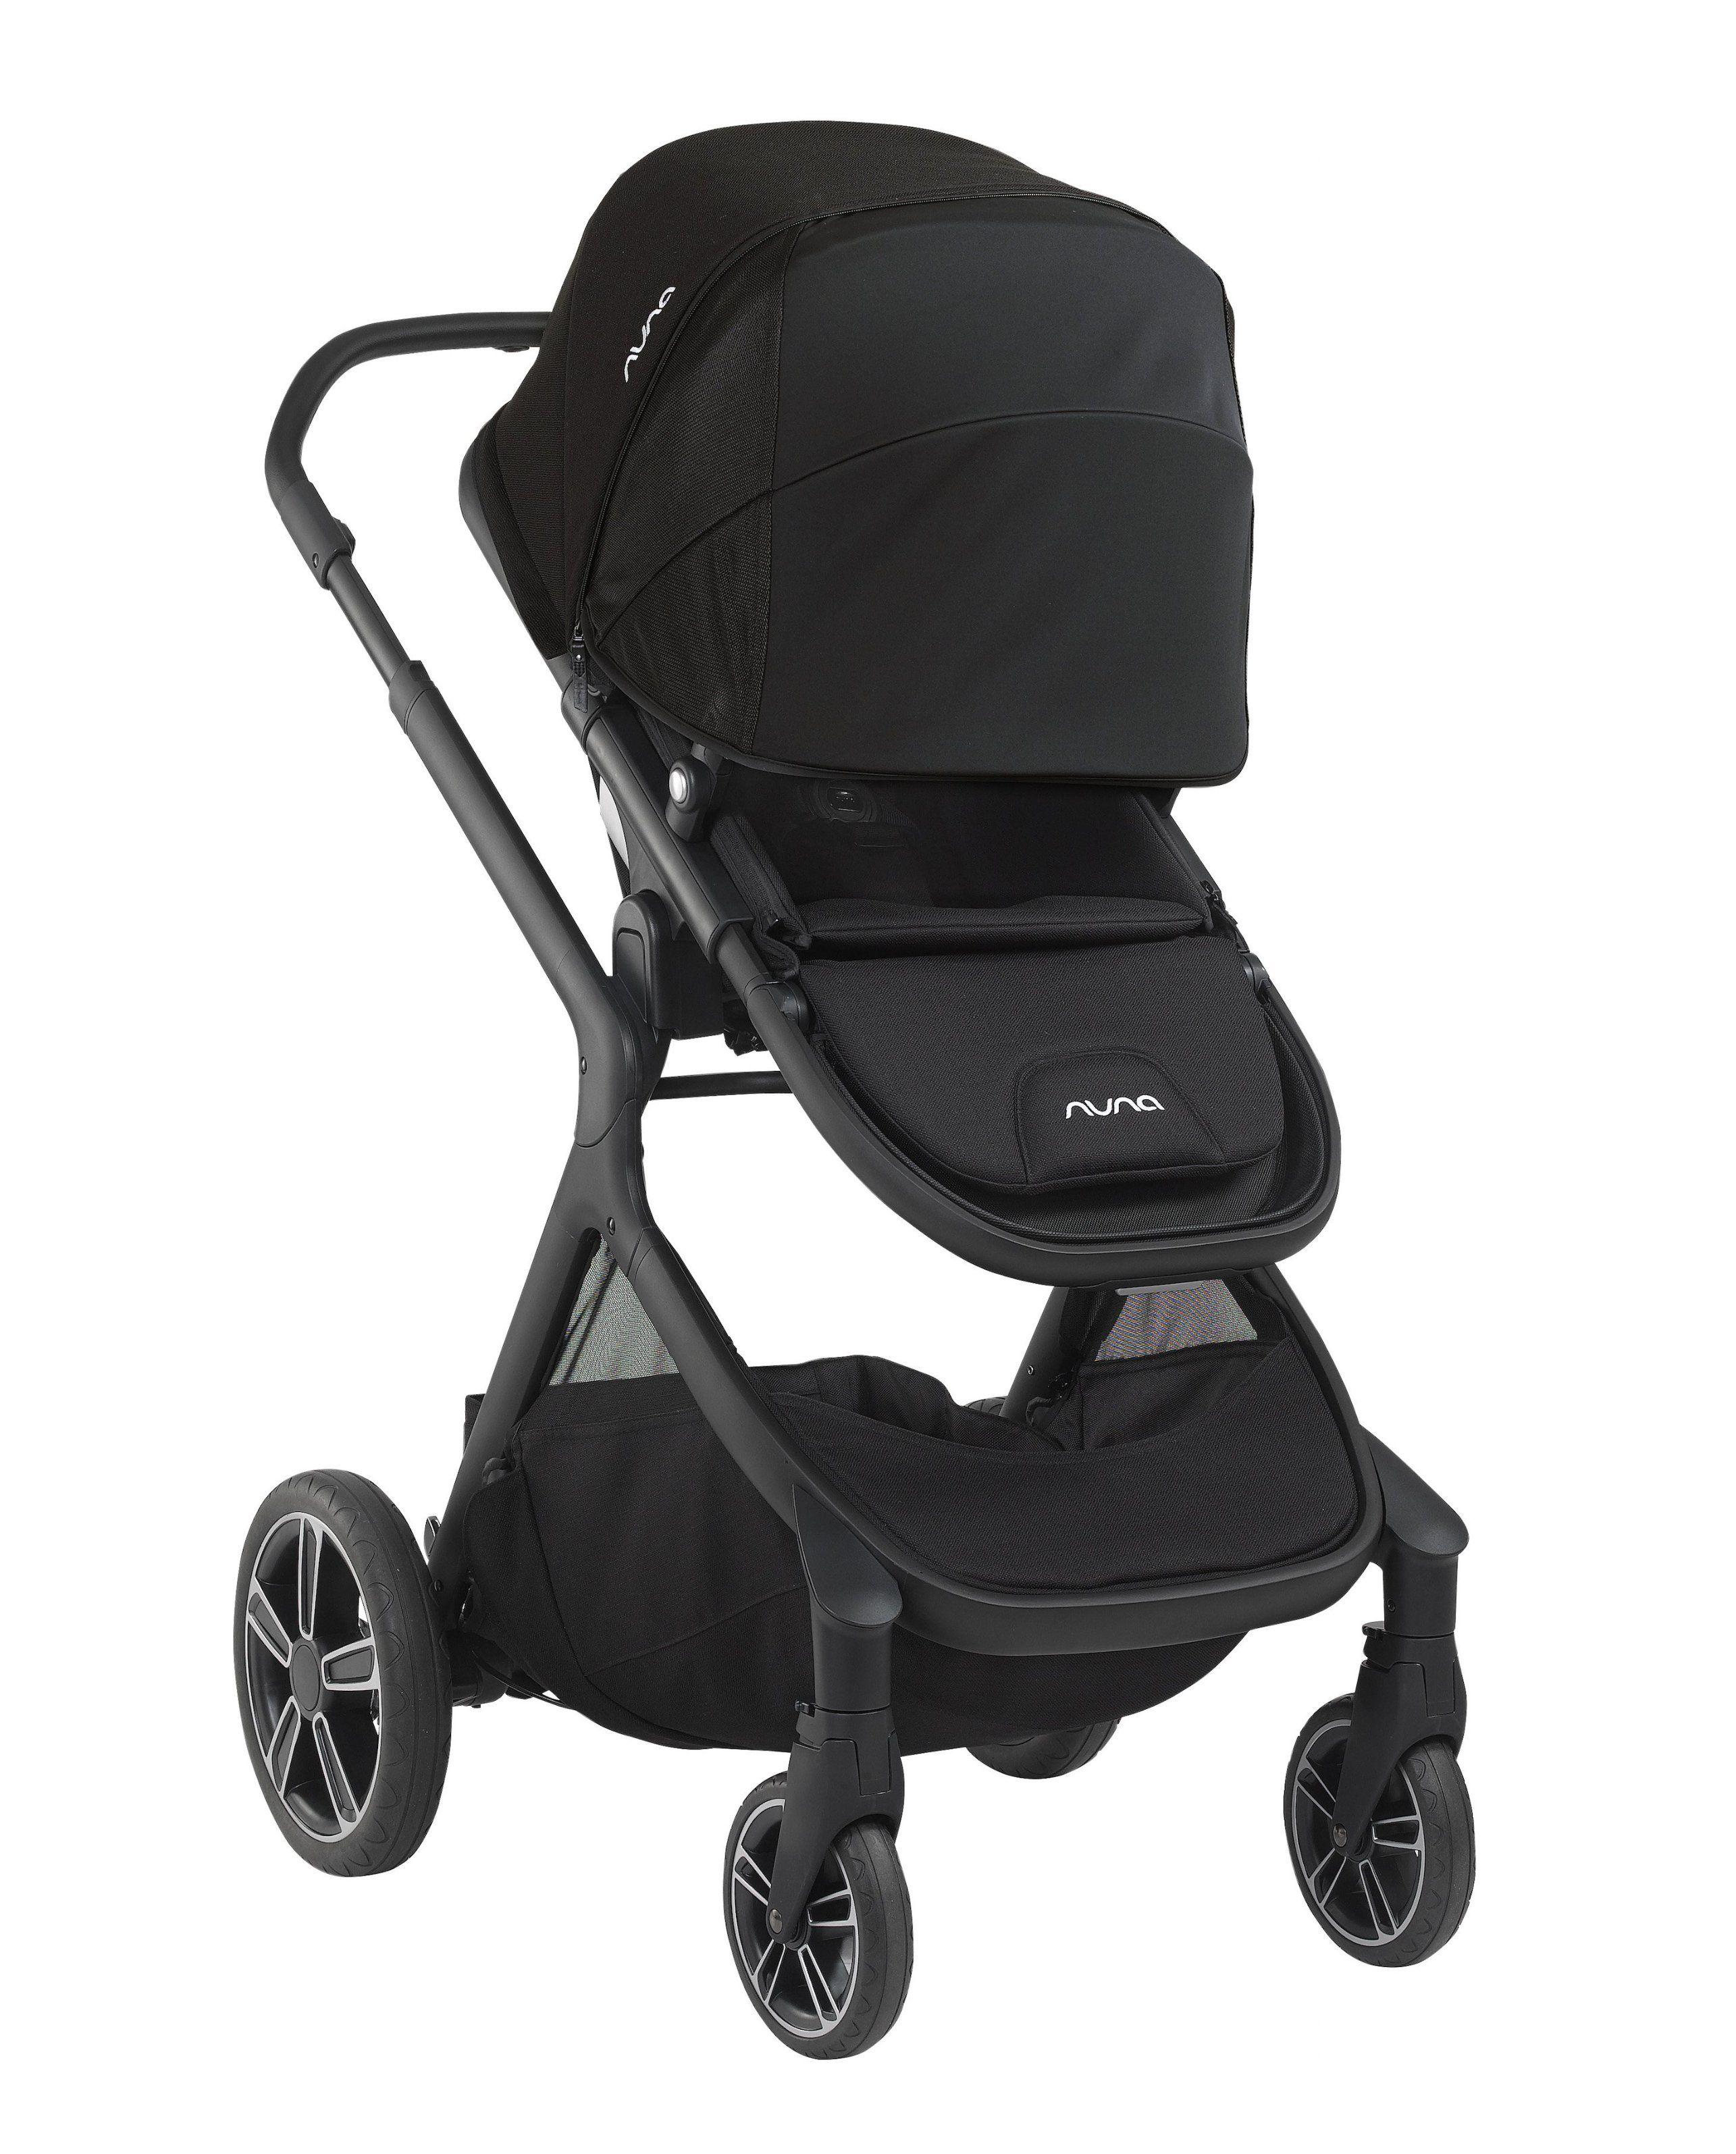 Nuna Demi Grow Stroller Convertible stroller, Double